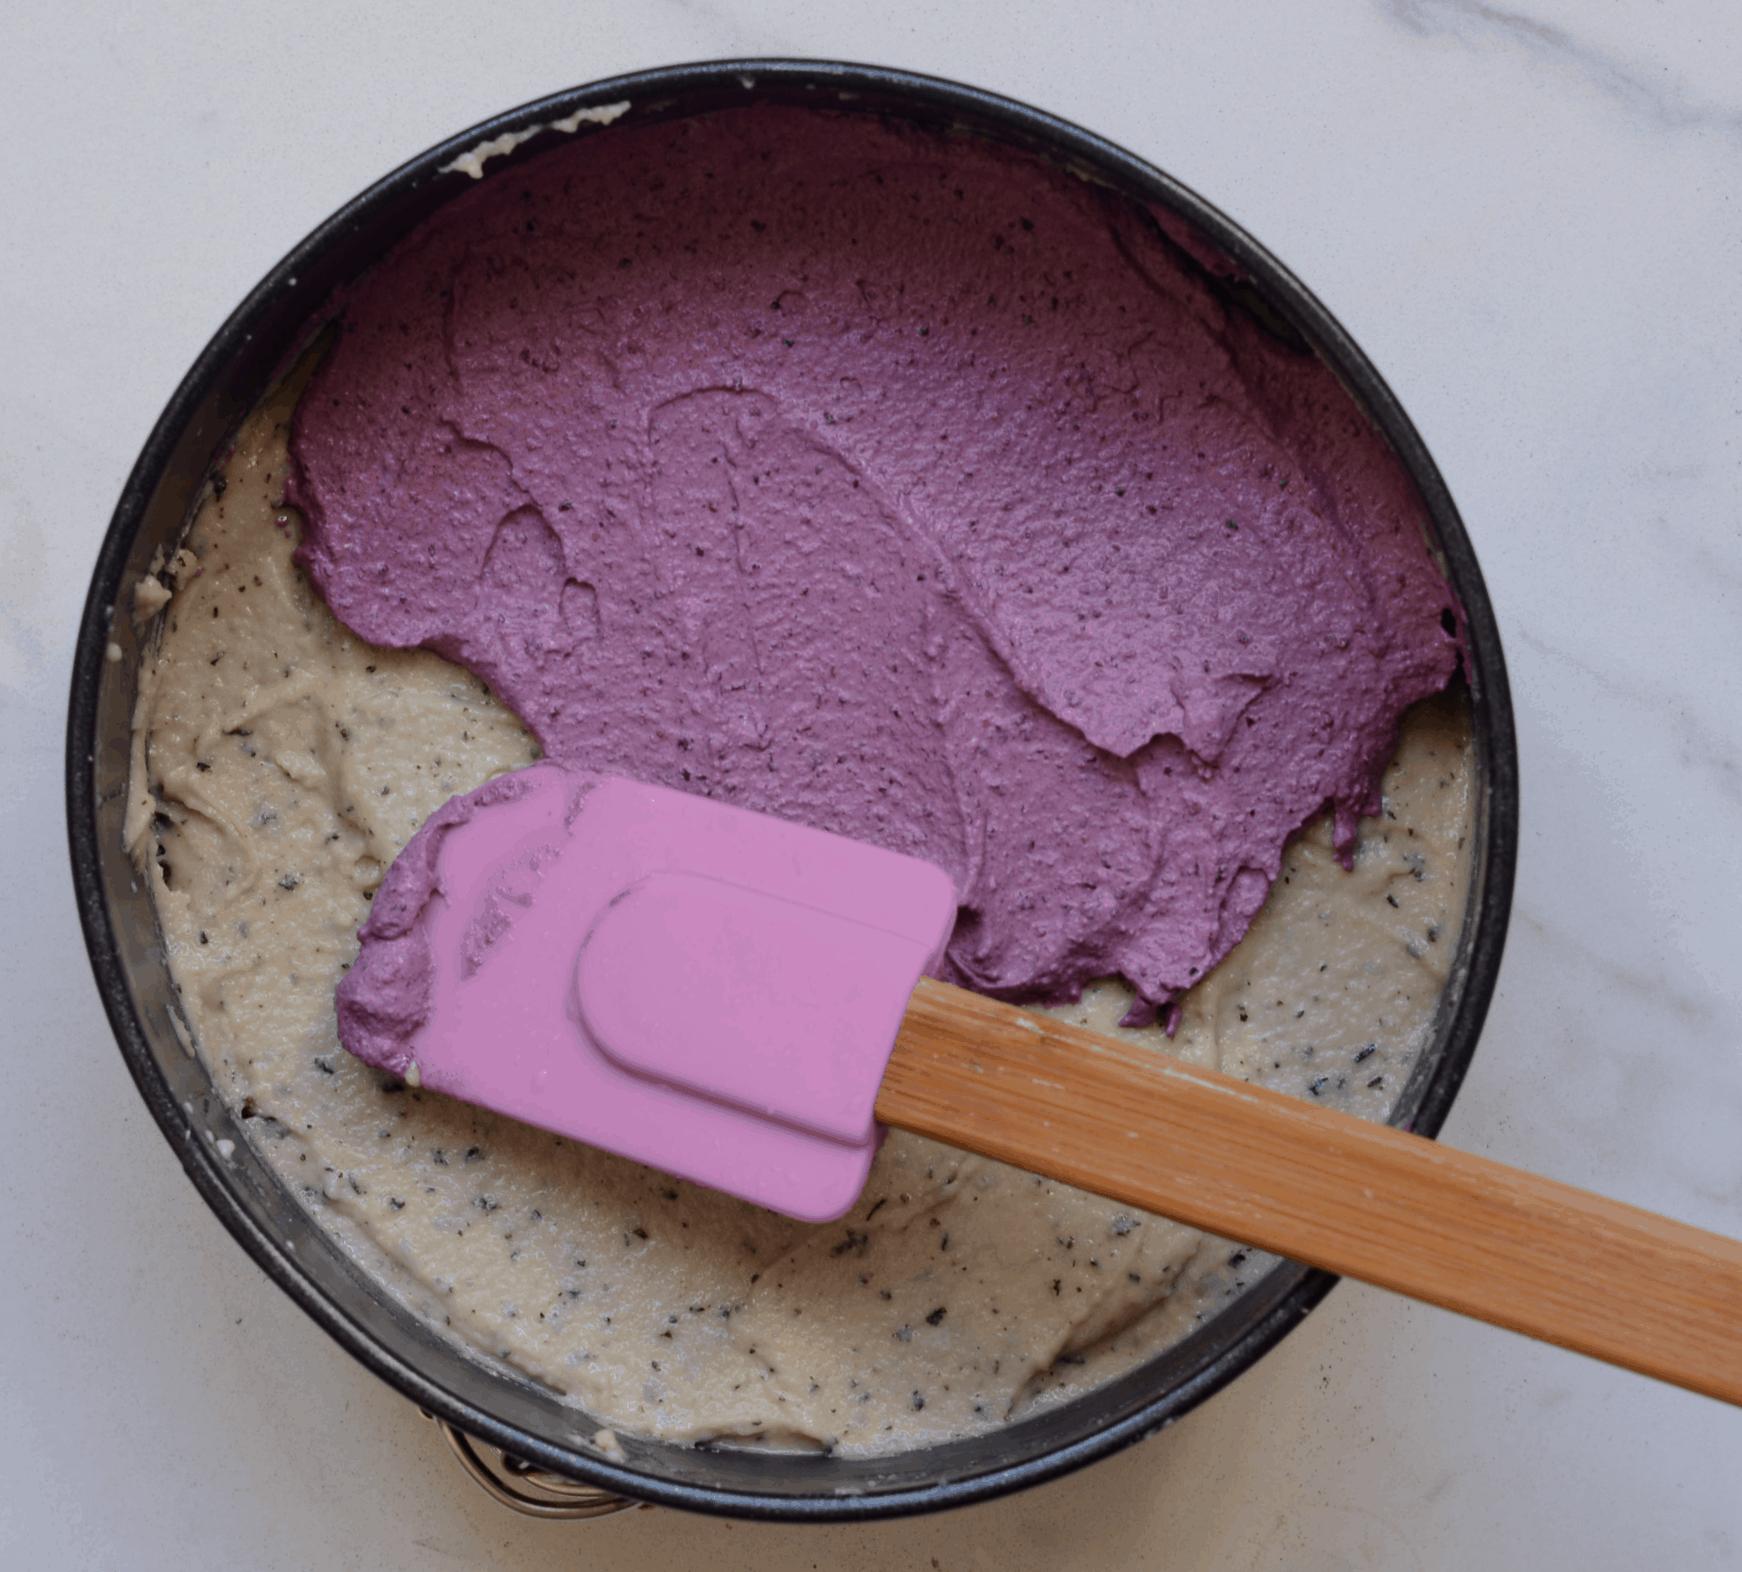 Adding second layer for No Bake Vegan Cheesecake